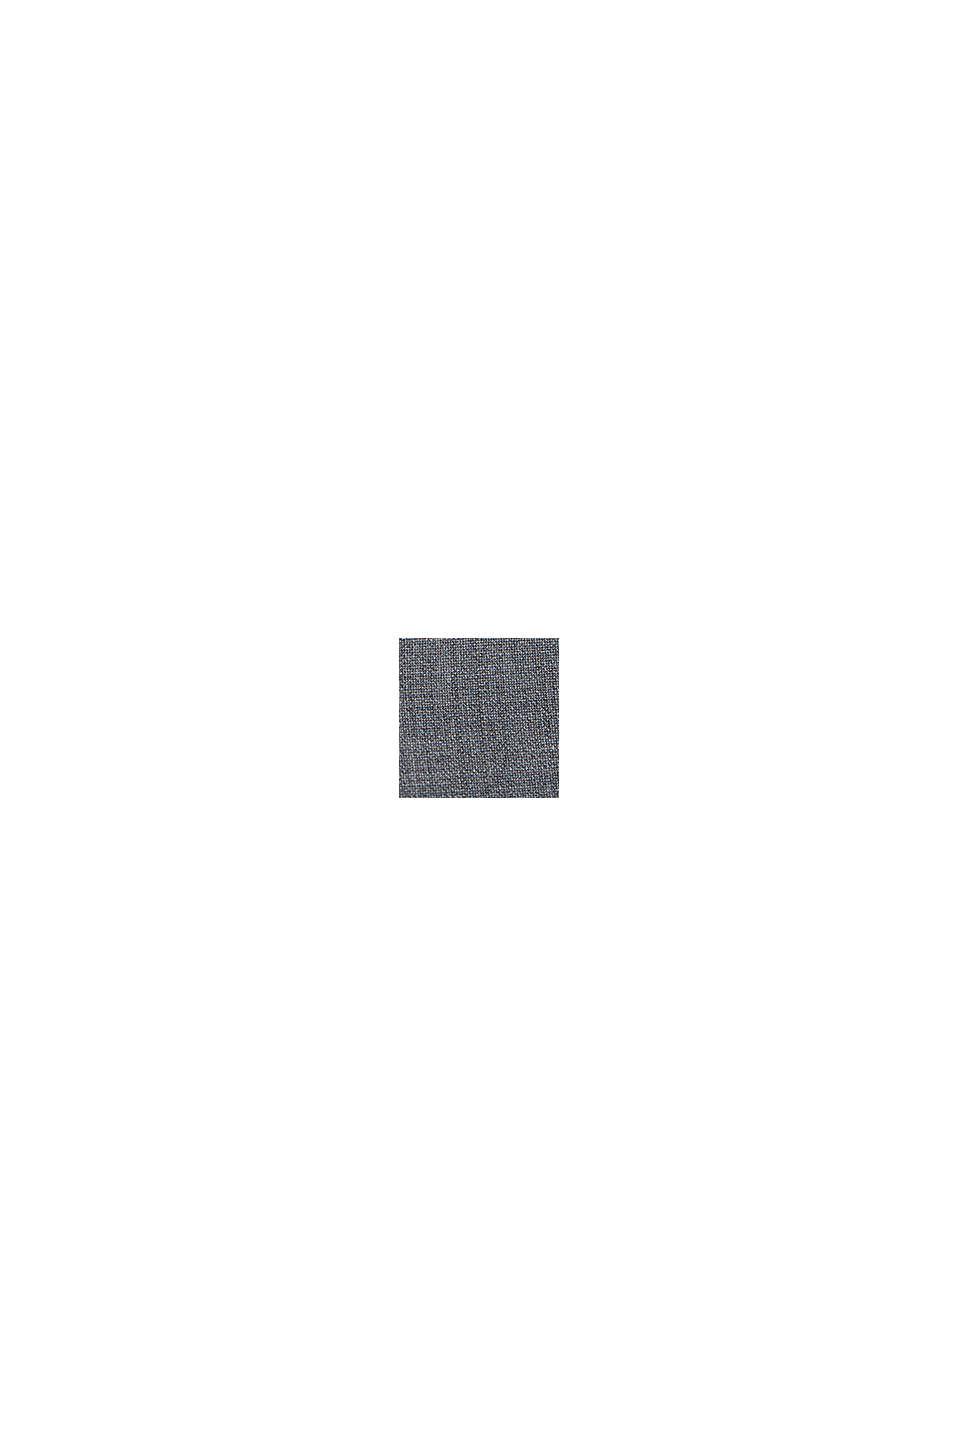 Con lana: Pantaloni ACTIVE Mix + Match, GREY, swatch